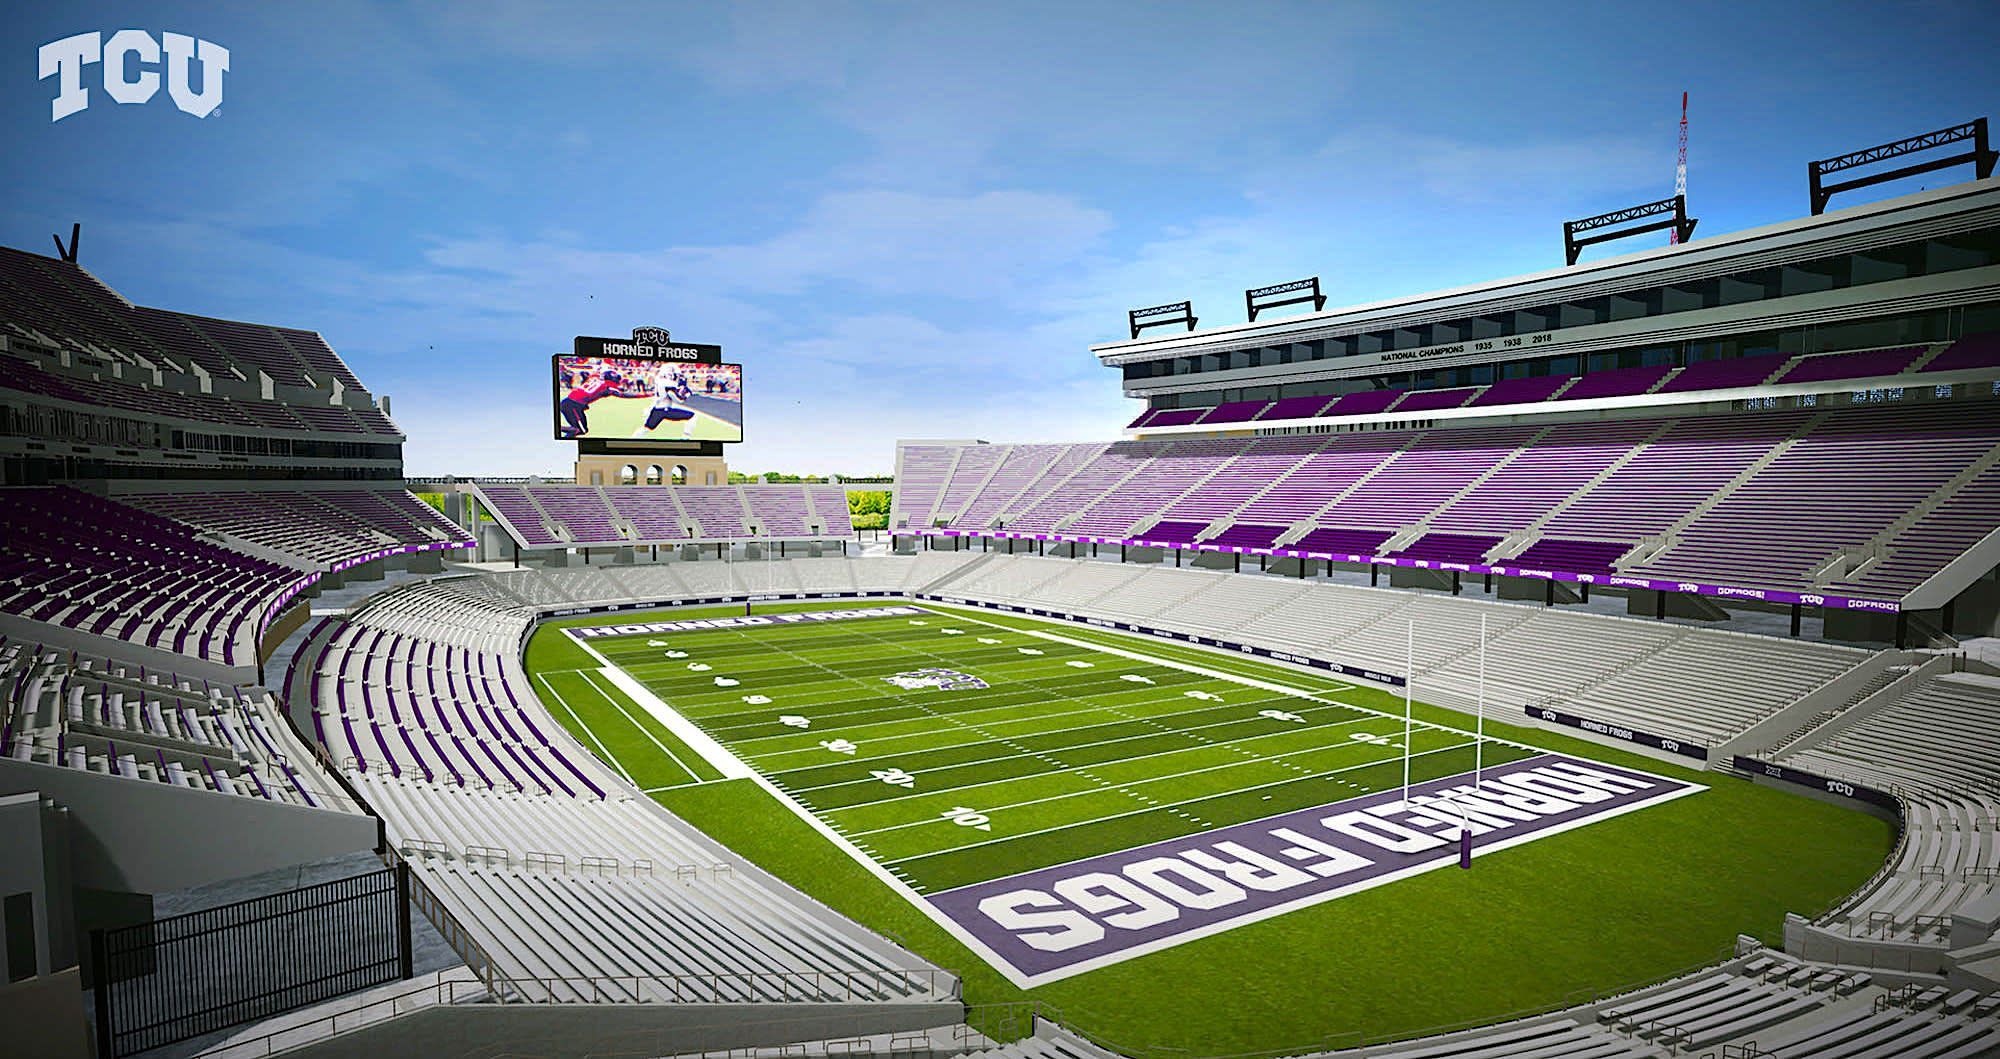 Expansion Stadium, Football stadiums, Renovations